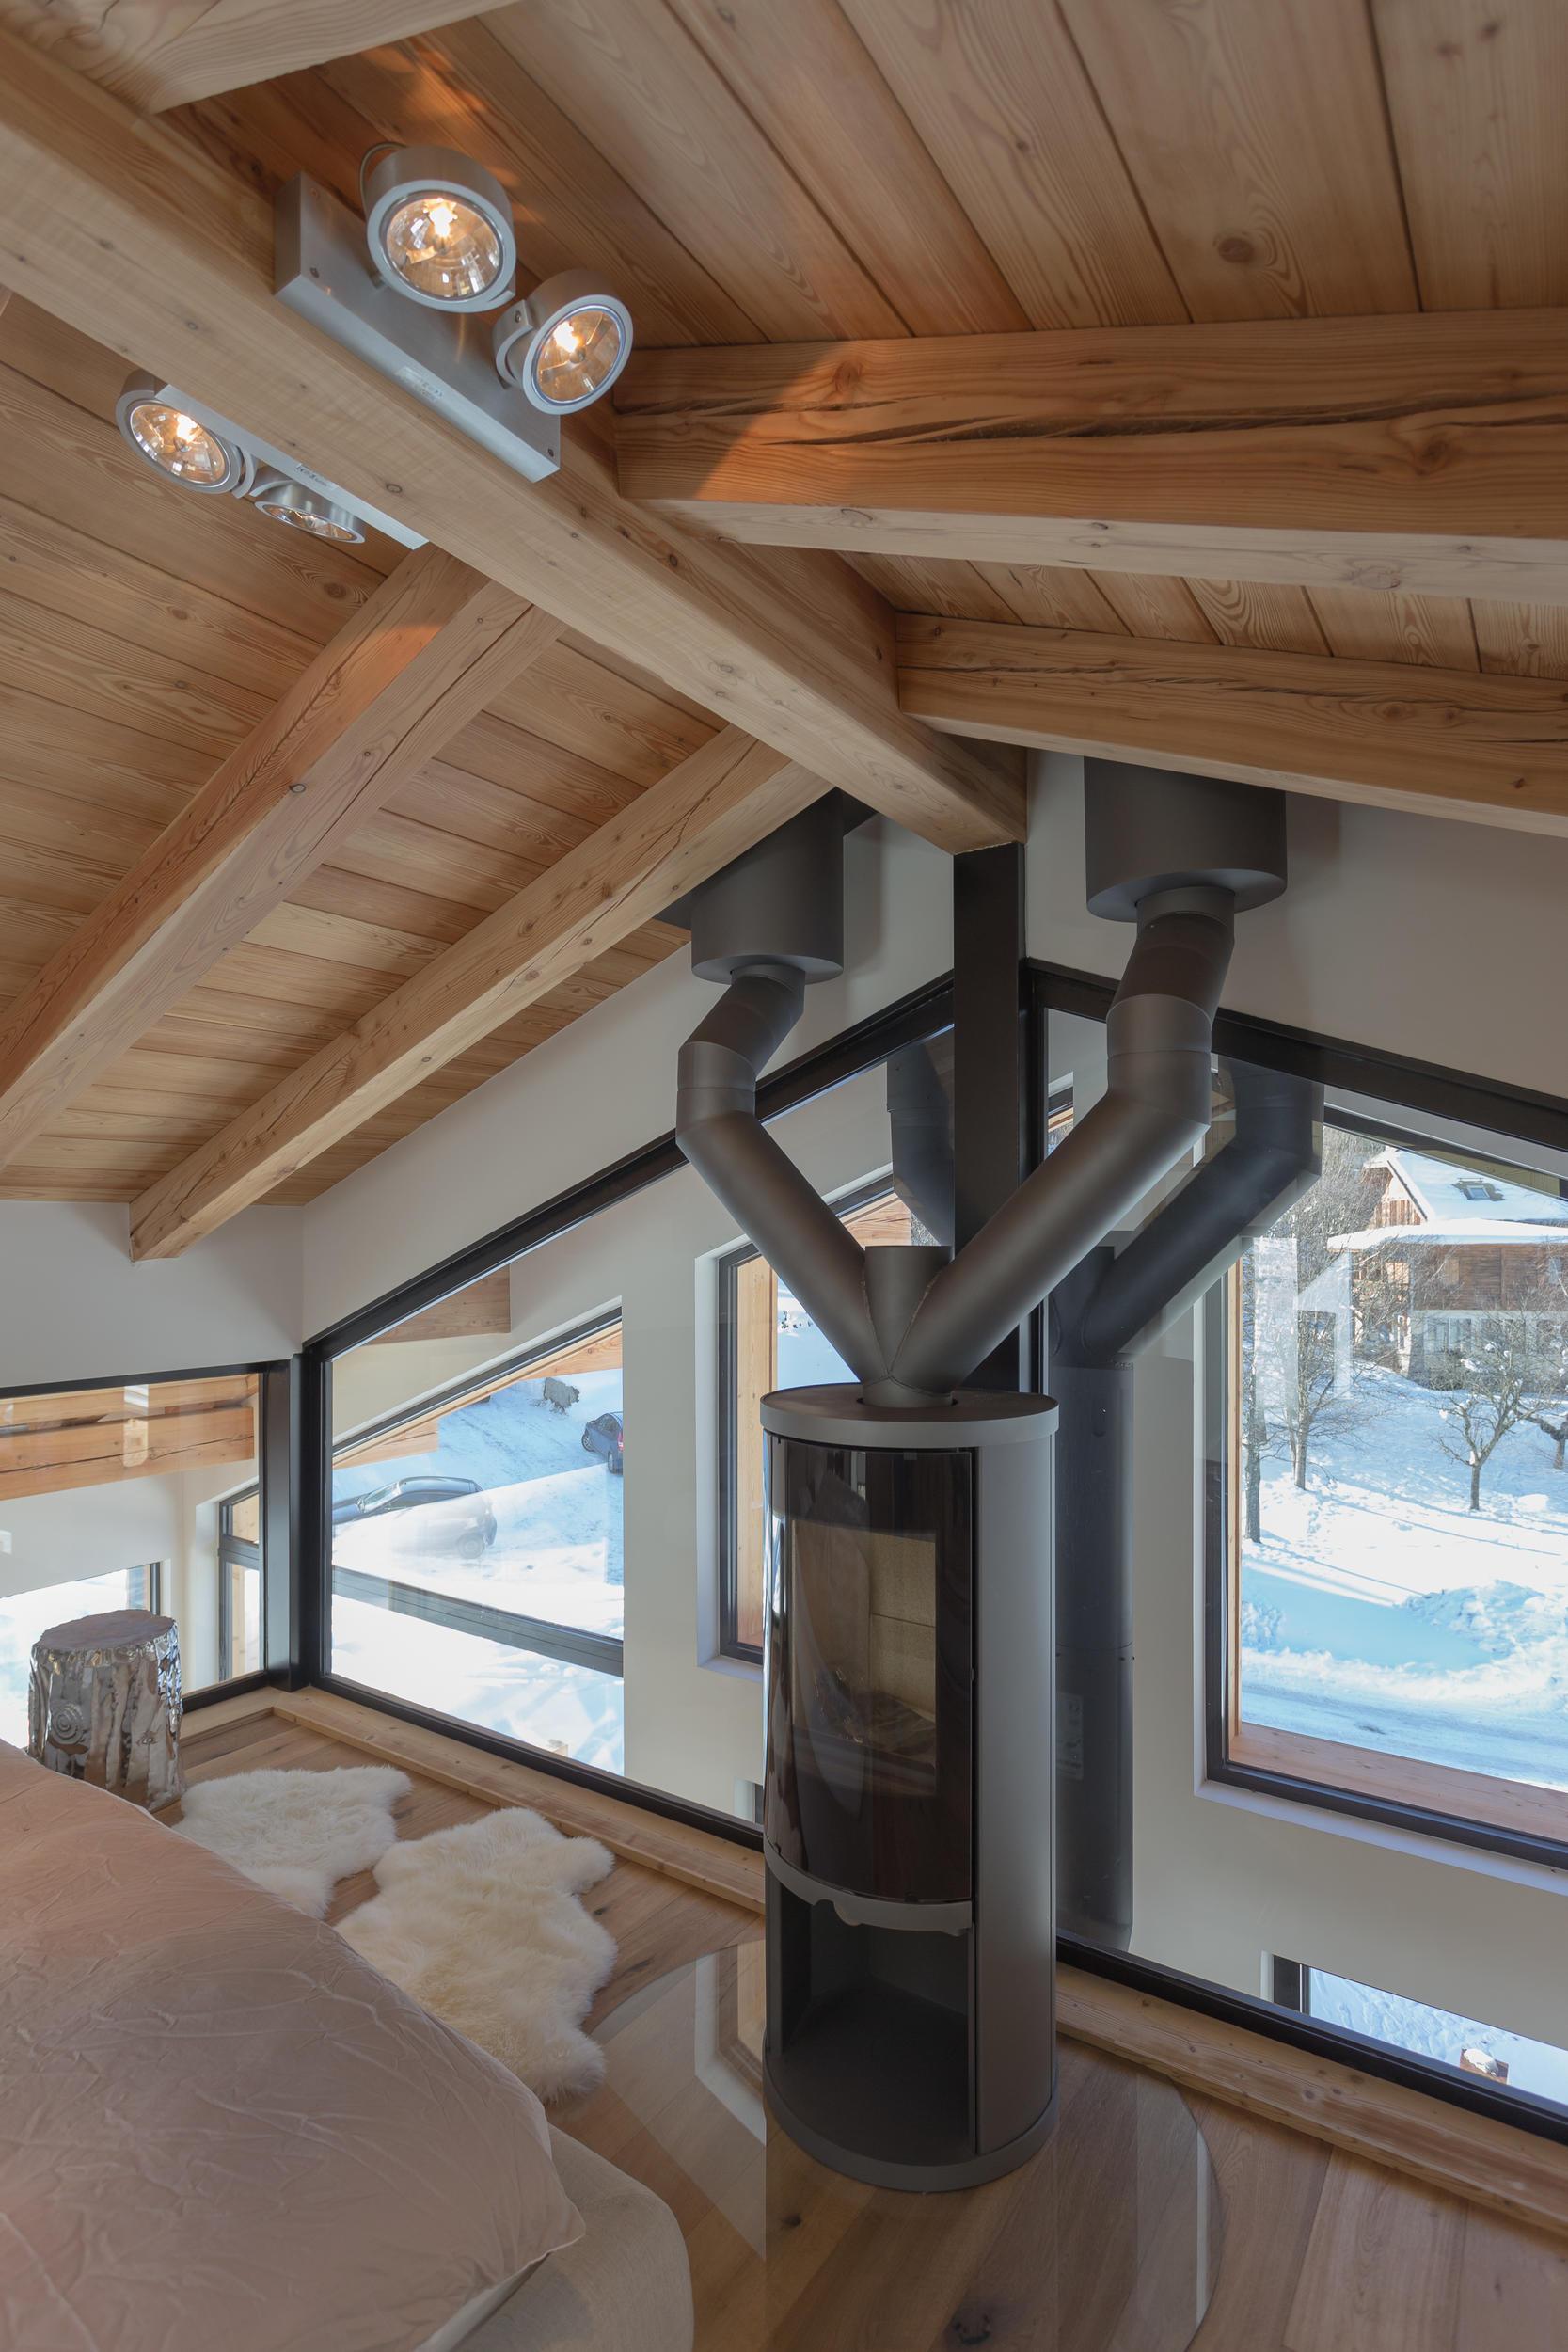 http://chevallier-architectes.fr/content/uploads/2016/05/ALPEN__77_sur_89_-450x450.jpg